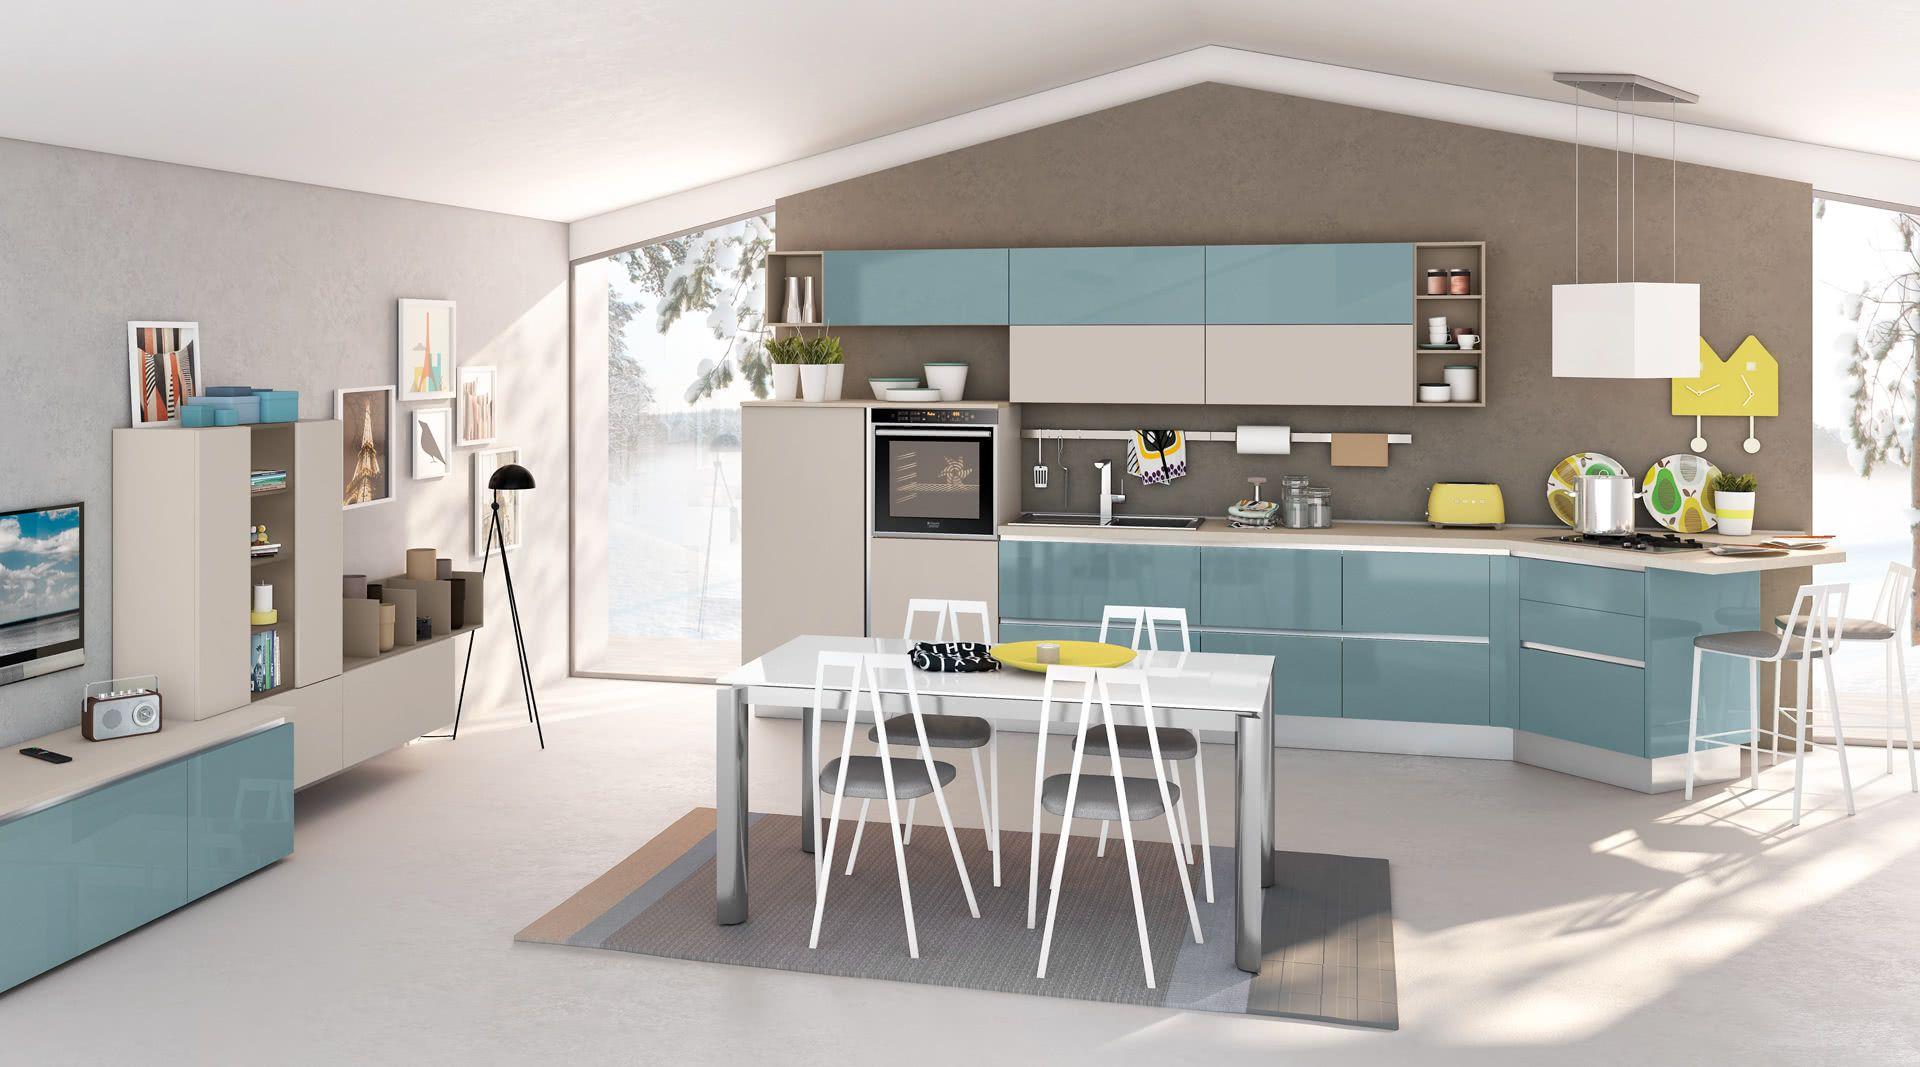 Cucina Kyra Creo Prezzo kyra - modern kitchens - creo kitchens   cucine moderne